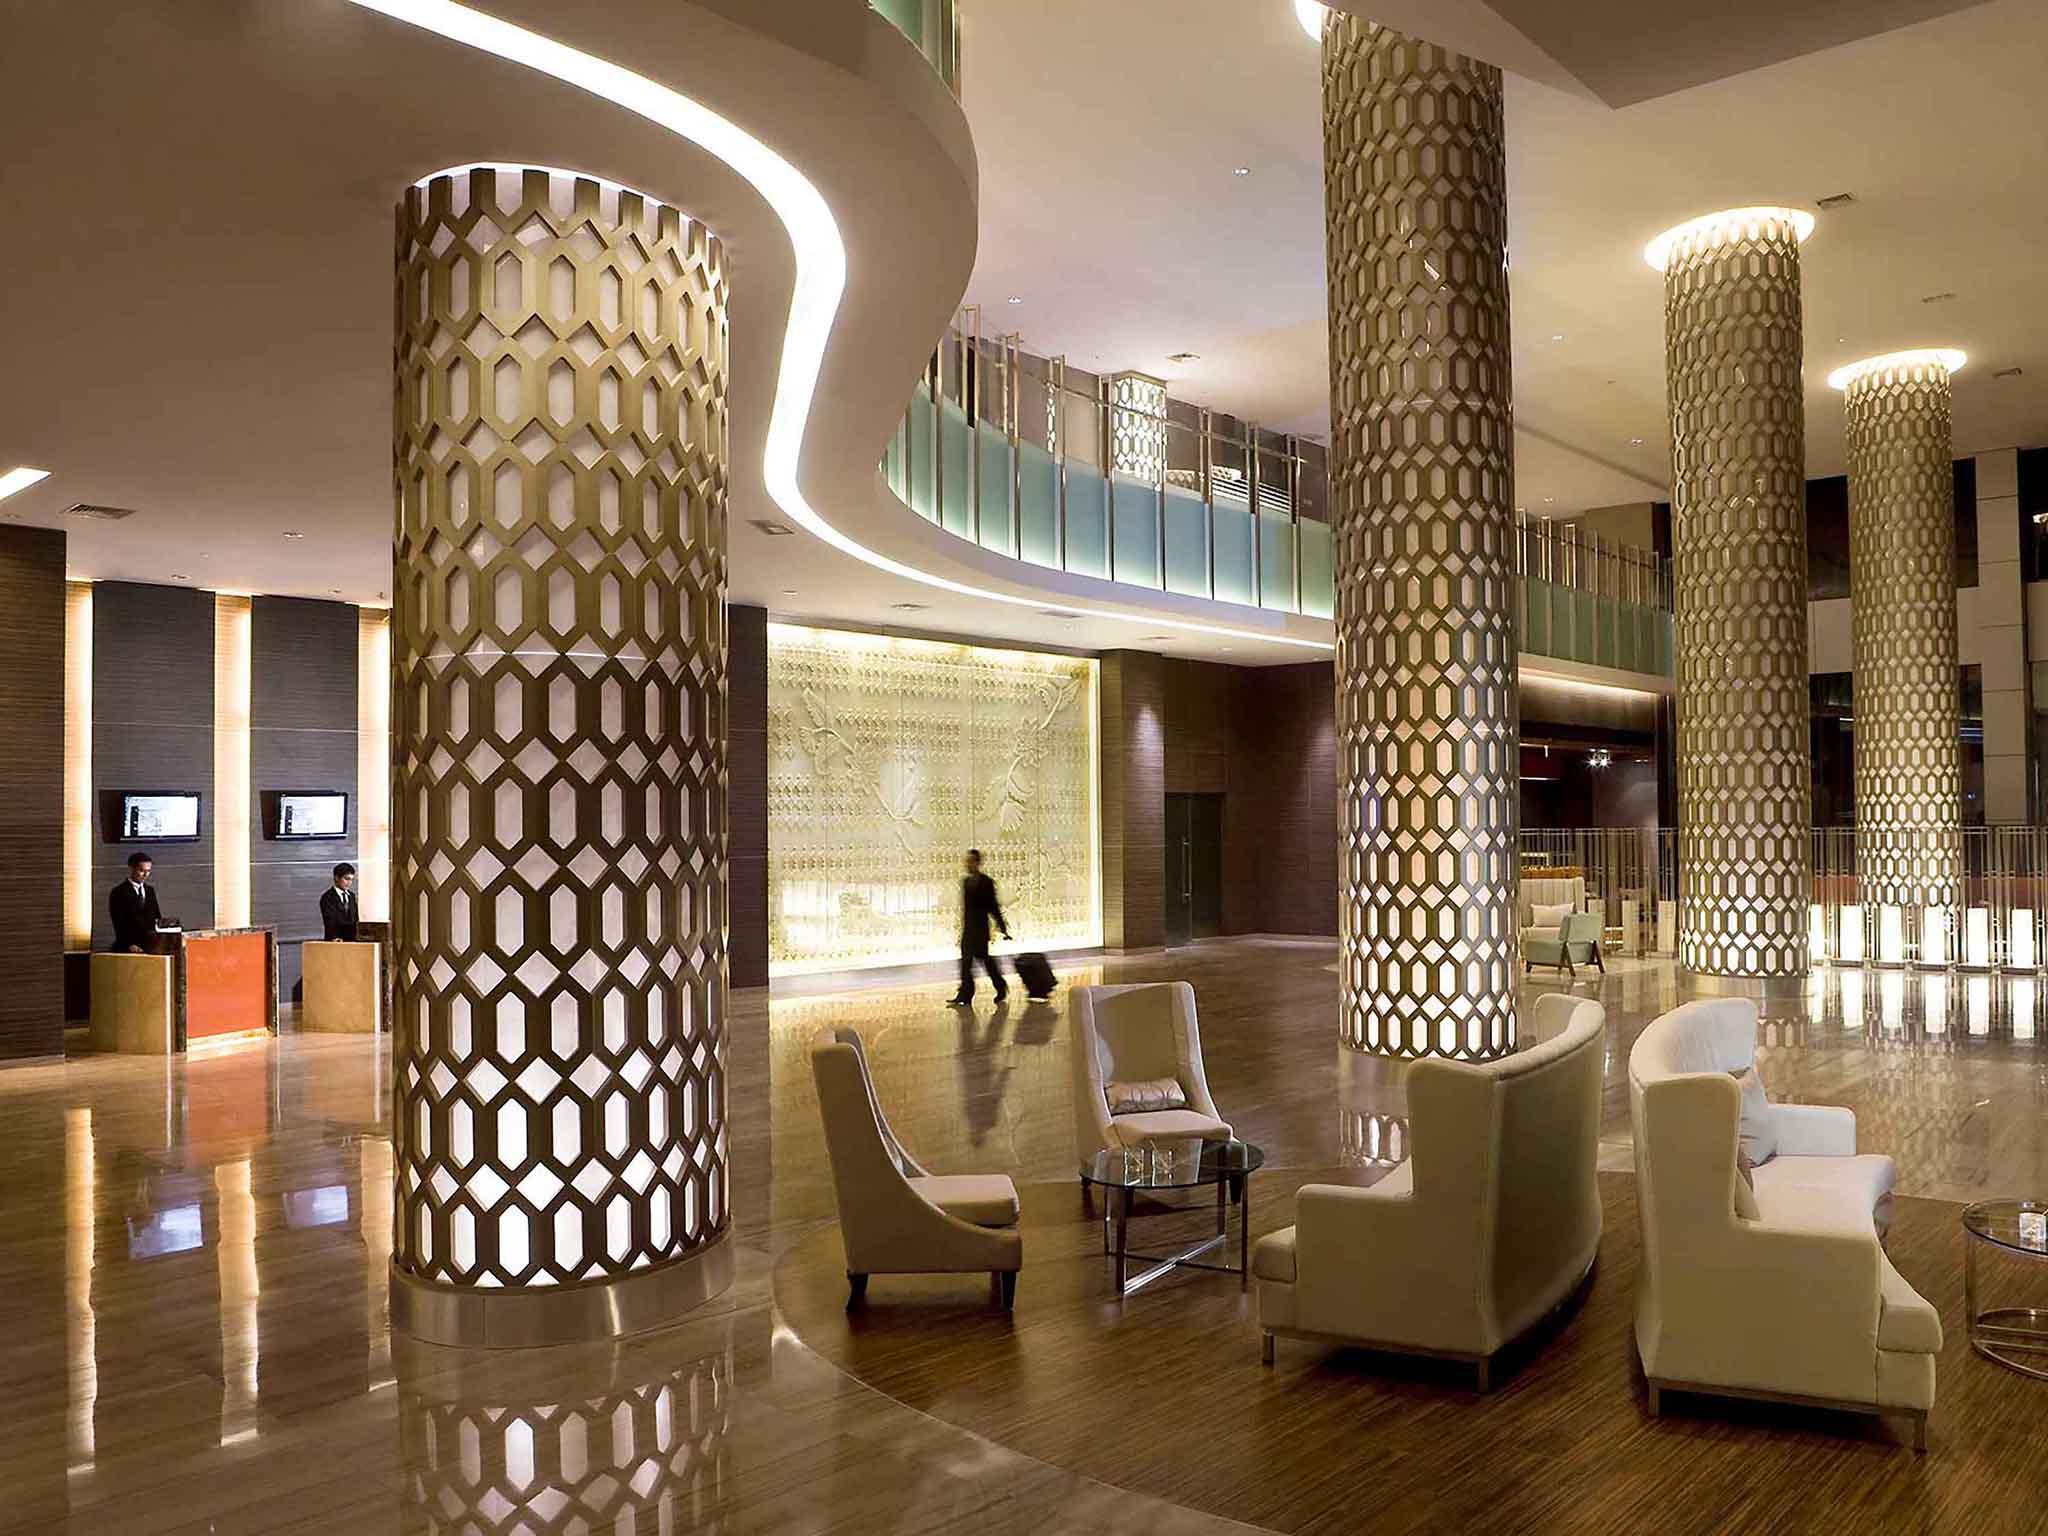 Hotel – Novotel Bangka - Hotel & Convention Centre